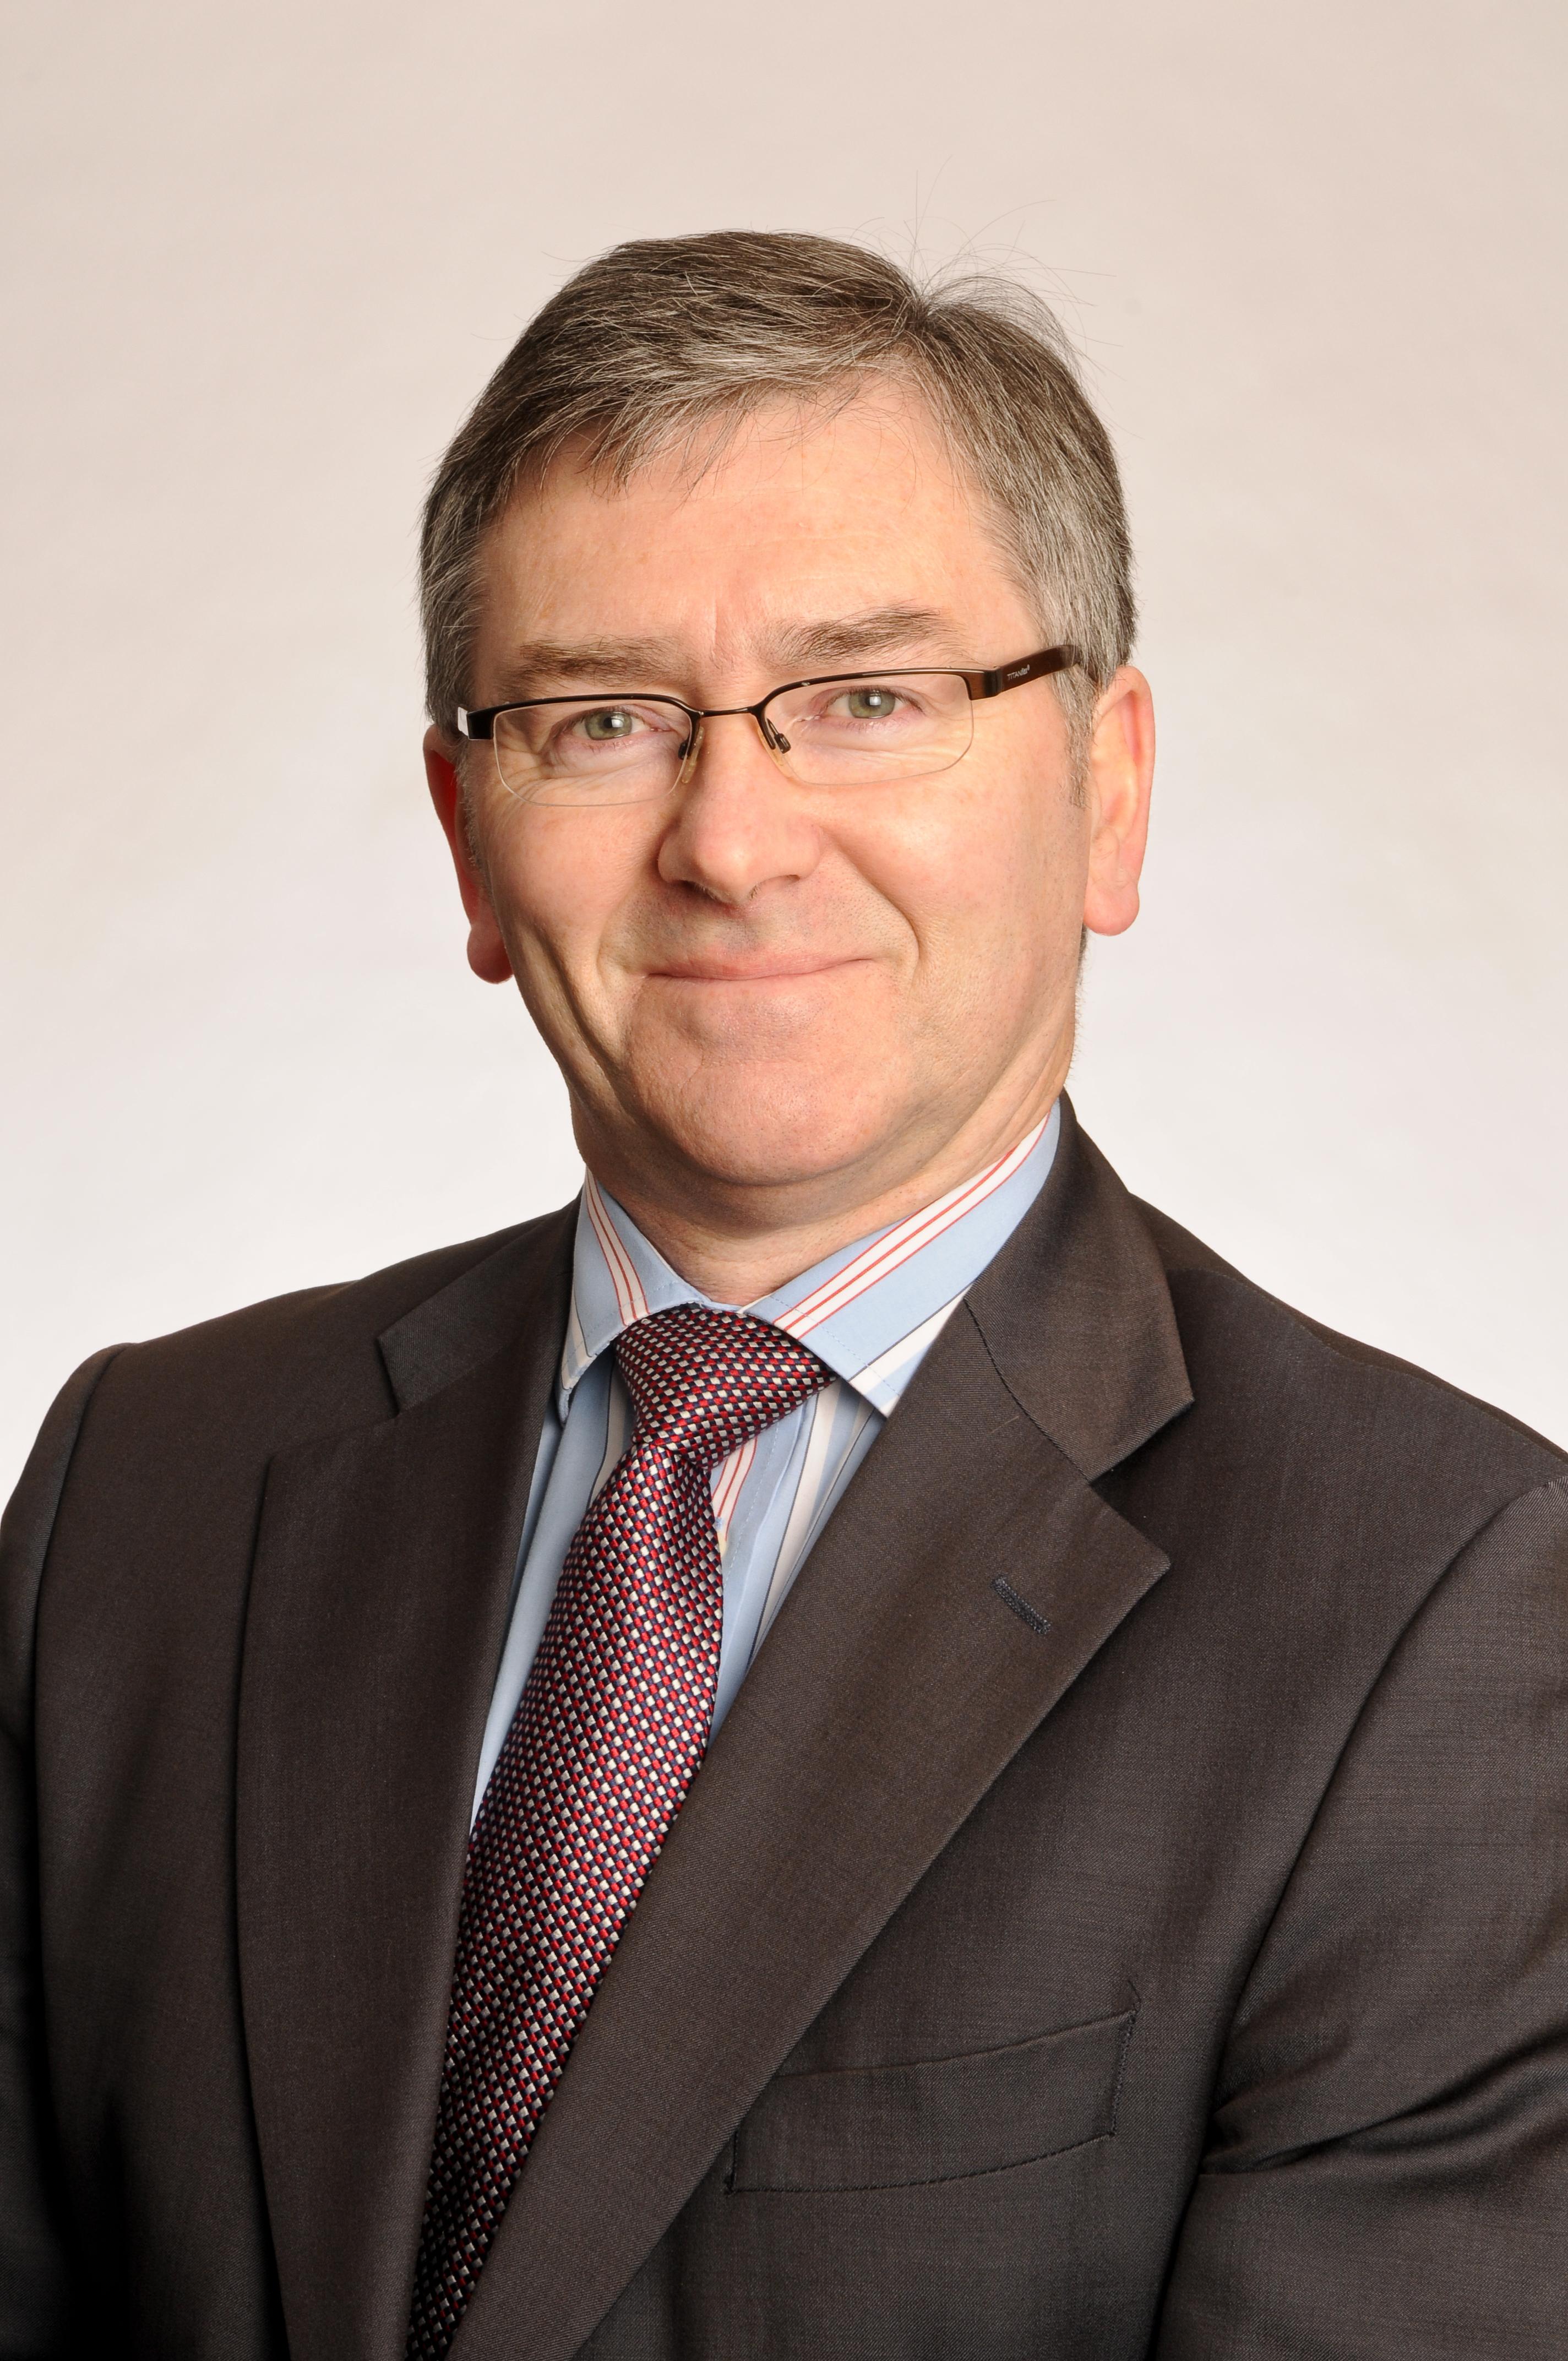 Graham Chisnall, deputy CEO, ADS